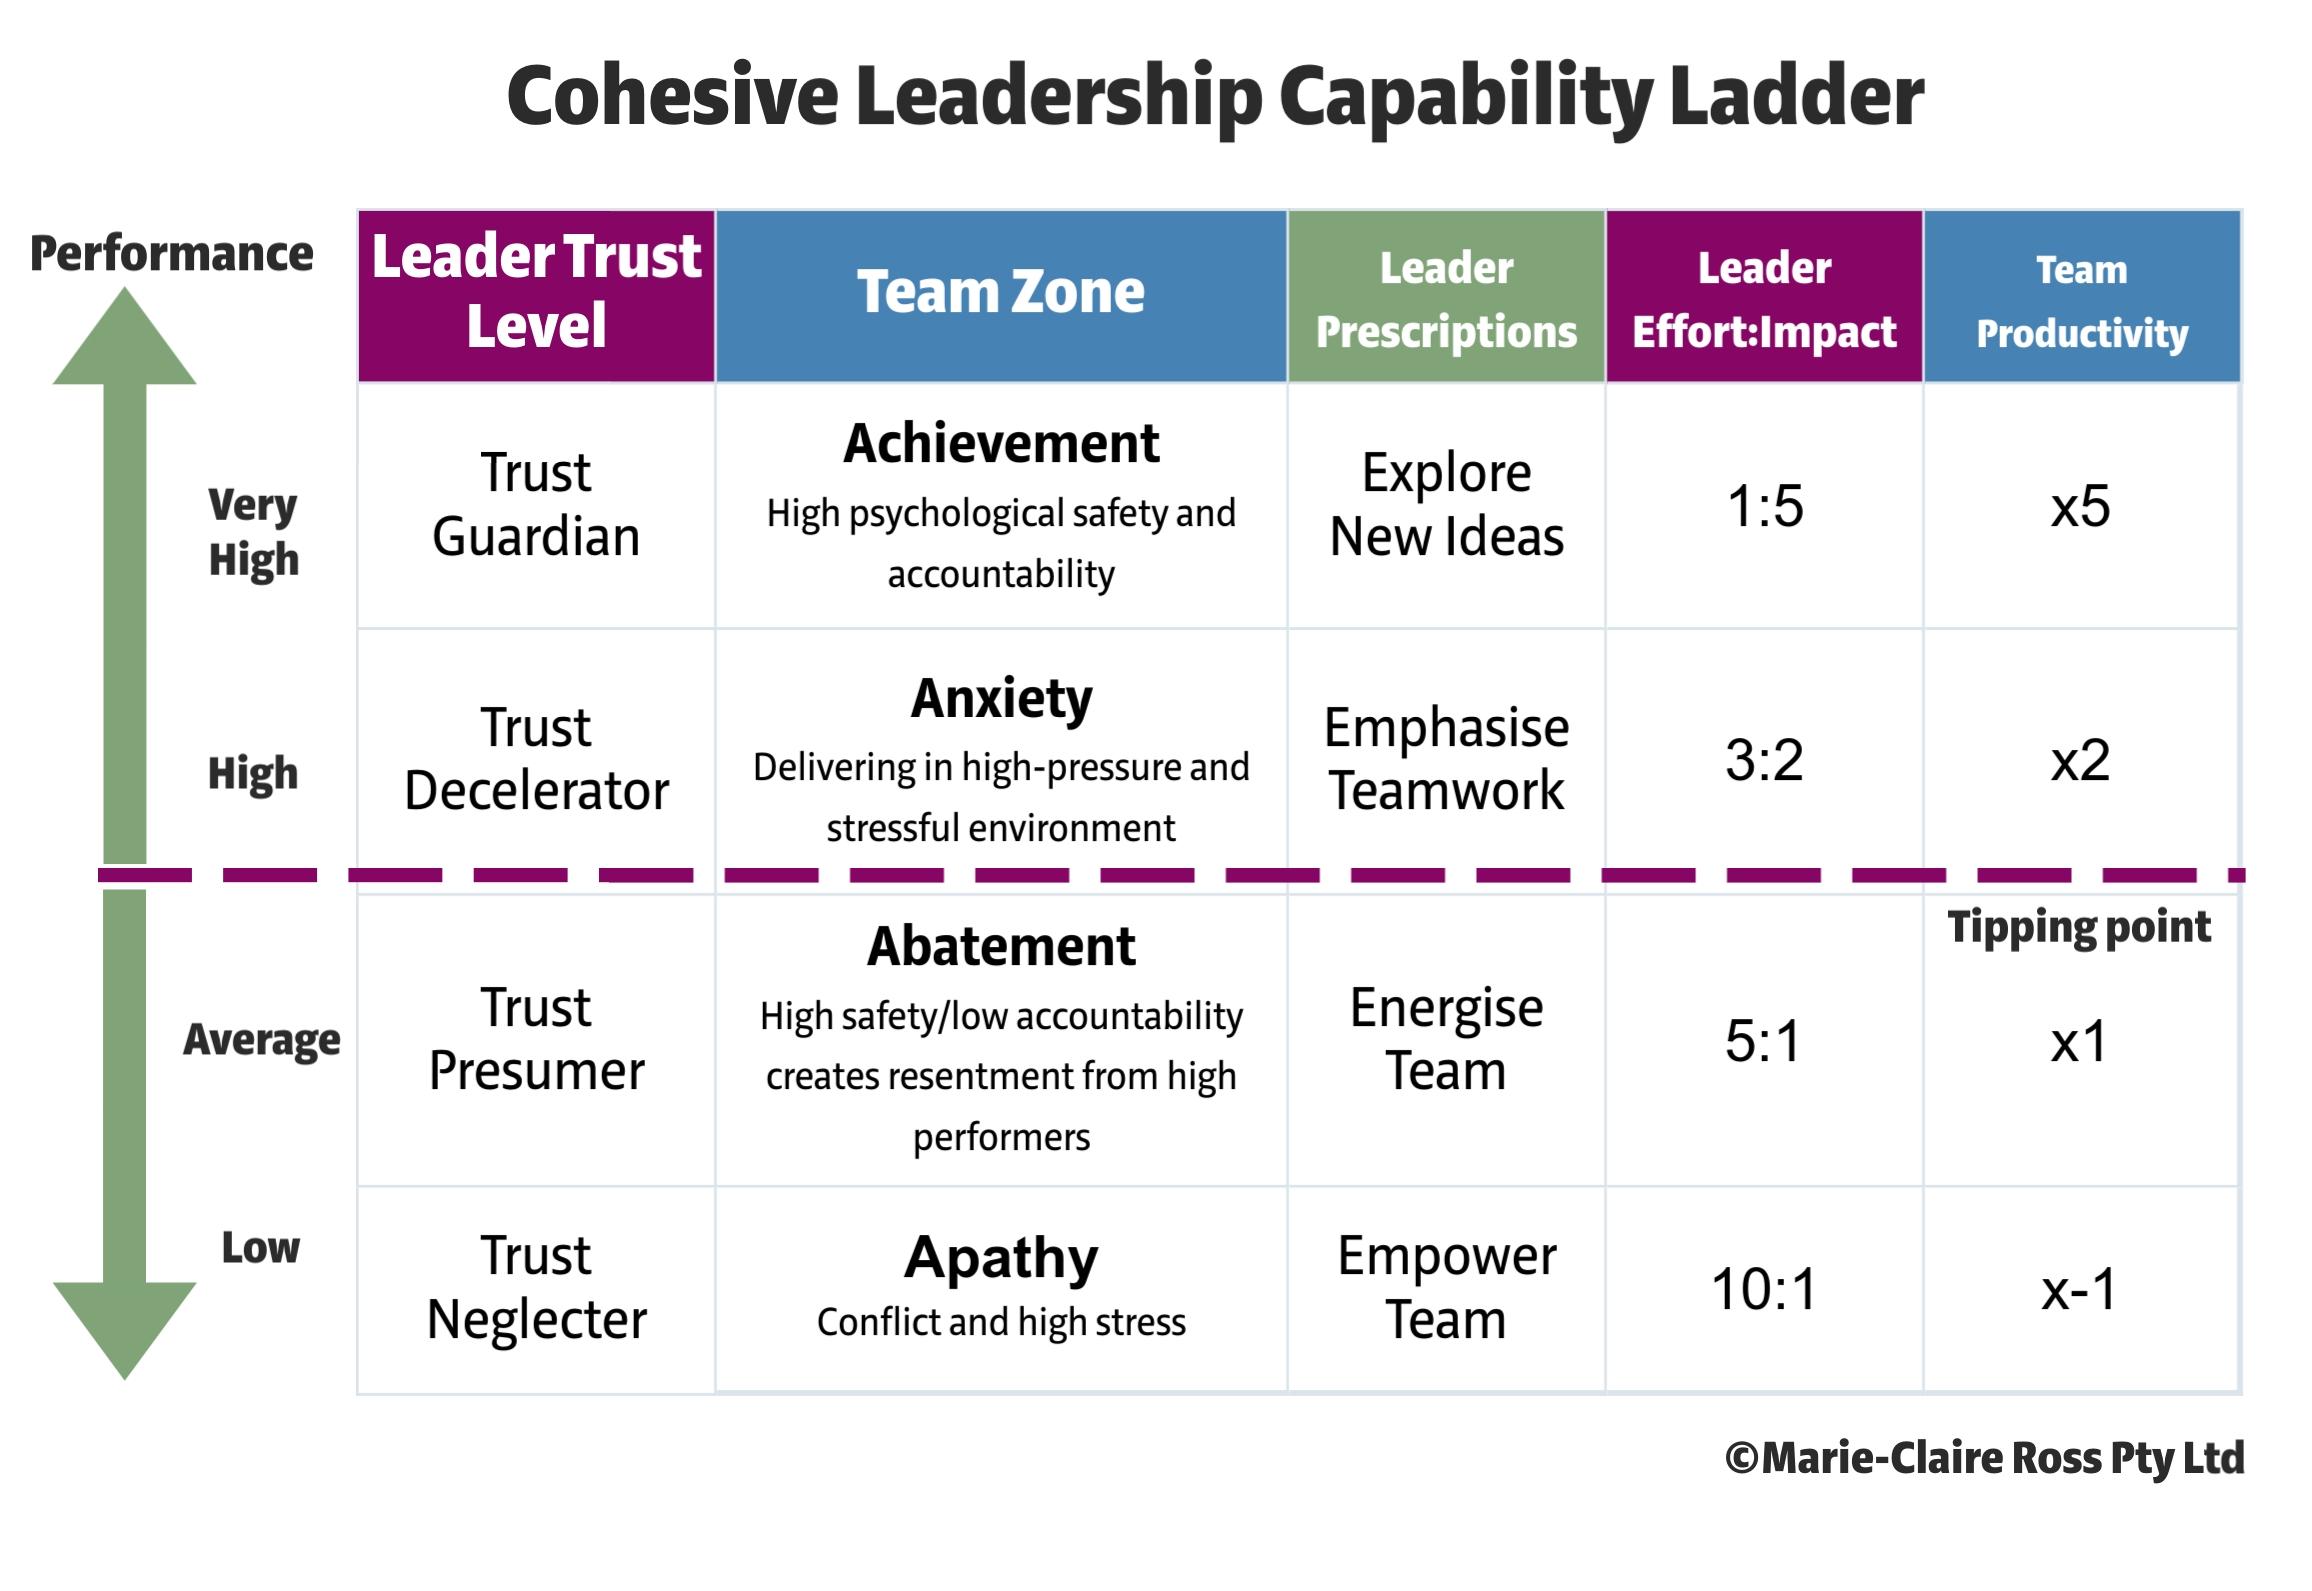 Cohesive-Leadership-Capability-Ladder